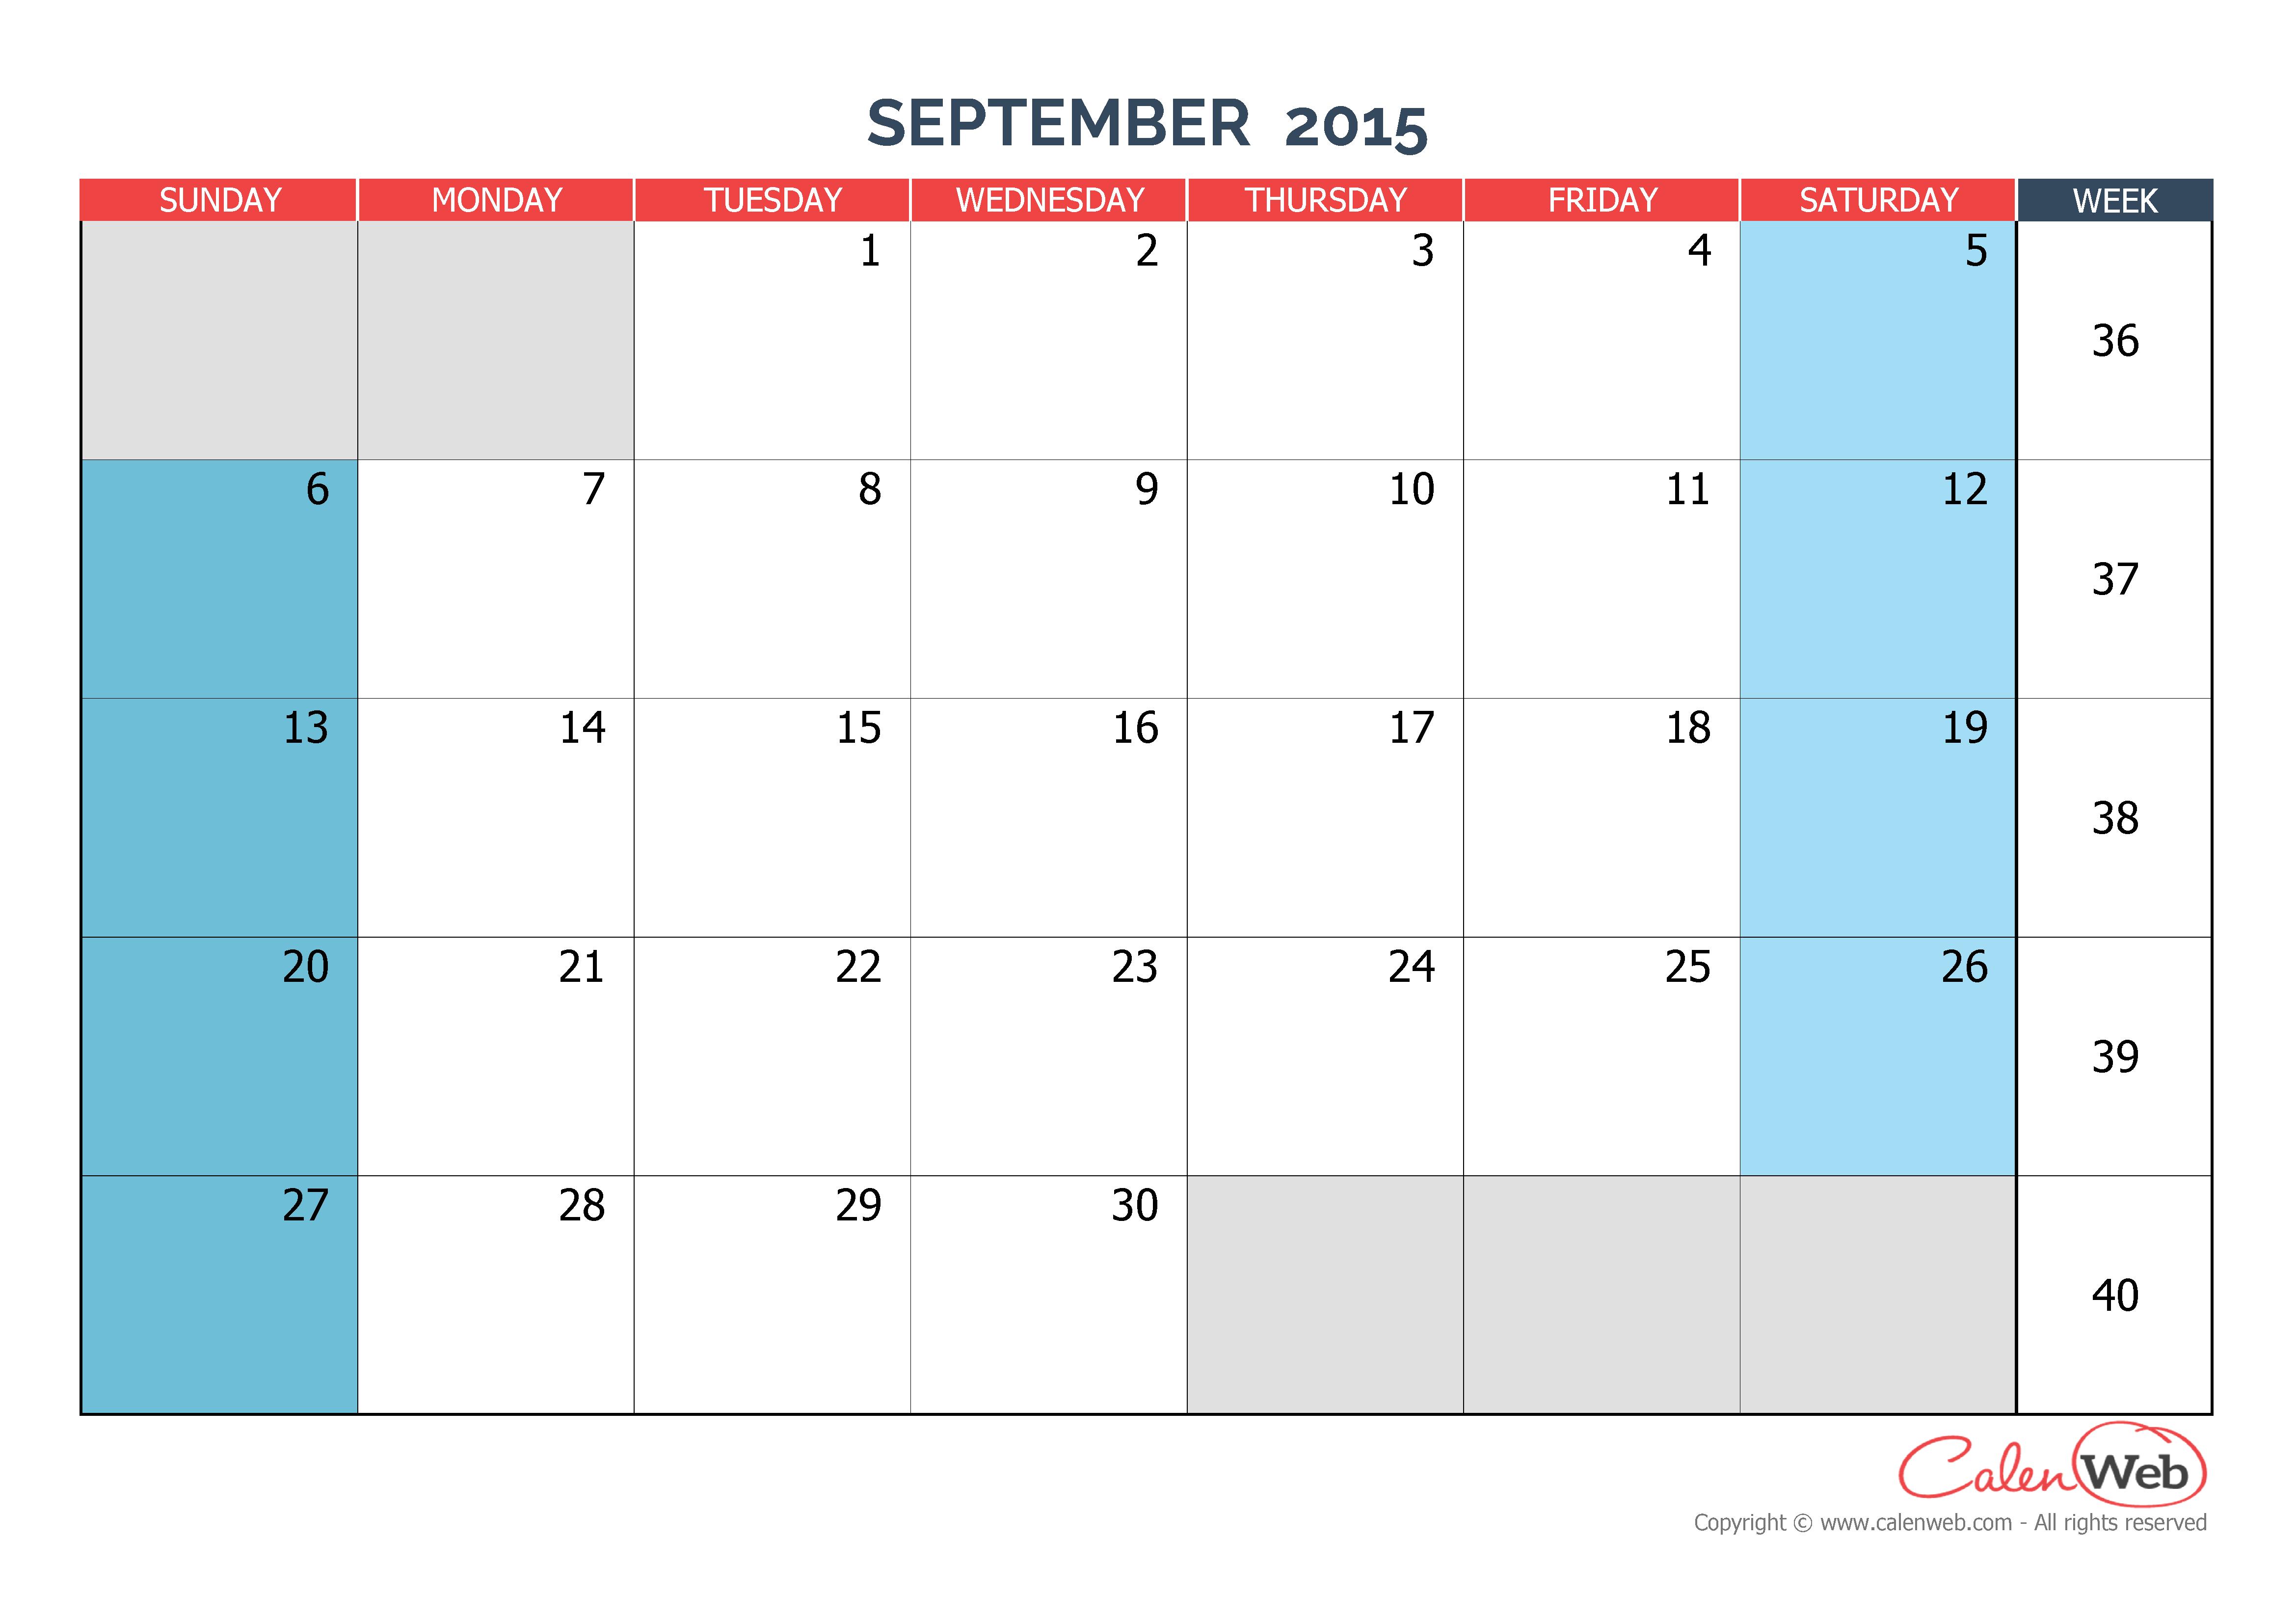 Monthly Calendar September : Monthly calendar month of september the week starts